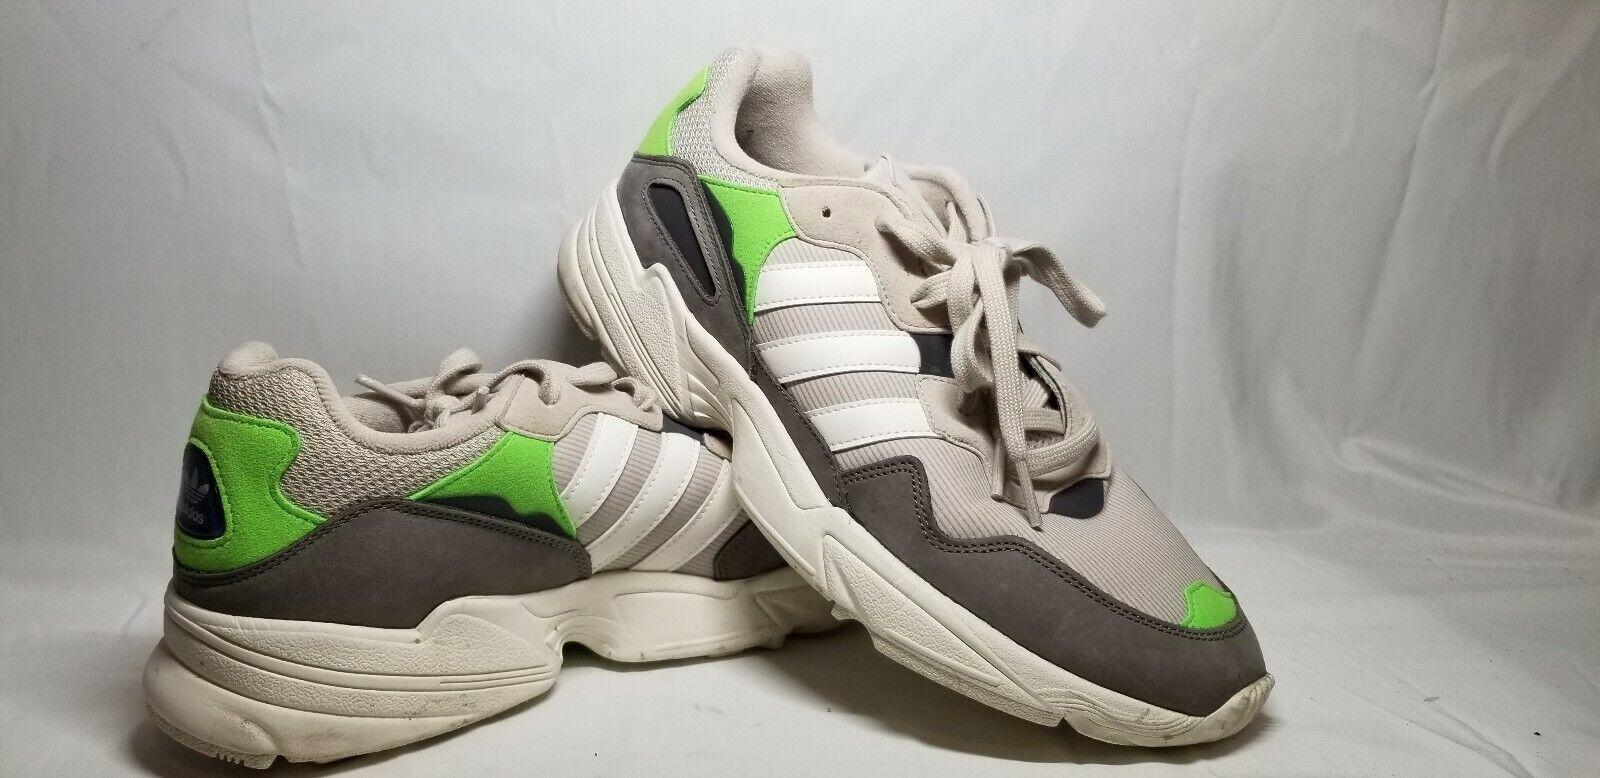 Mens Adidas Originals Yung-96 Dad Sneakers Size 9.5